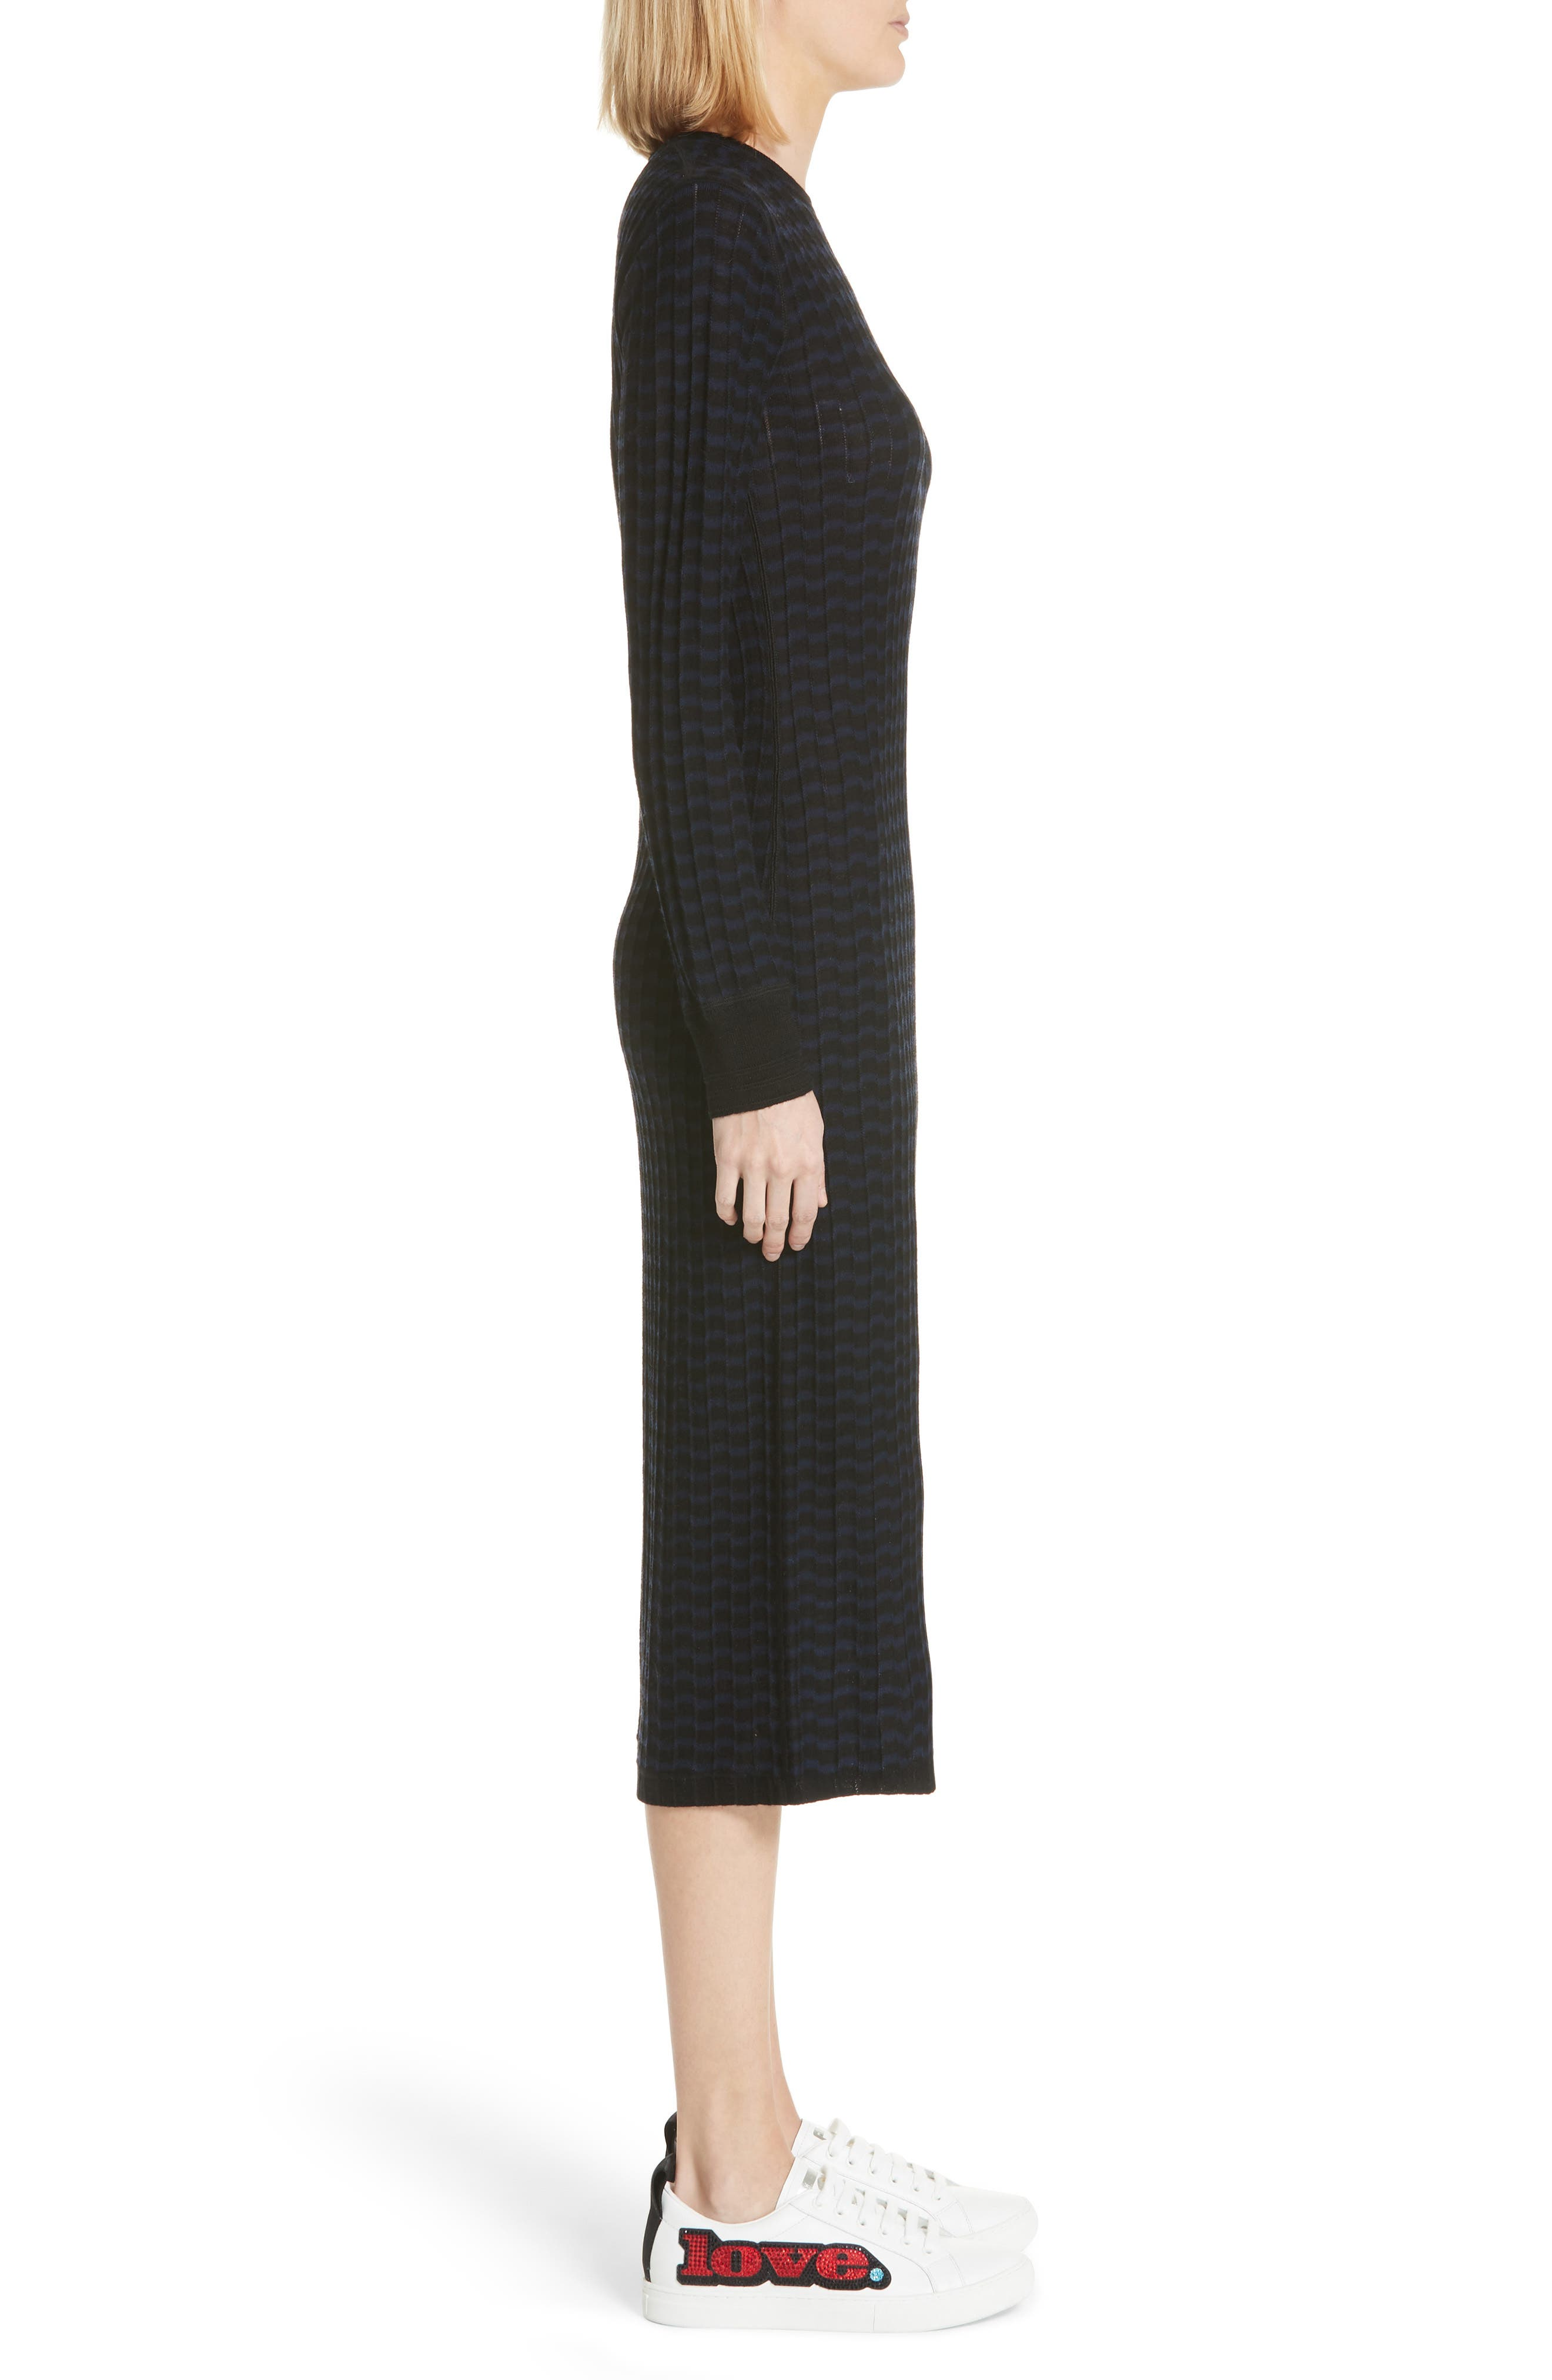 MARC JACOBS,                             Stripe Wool Sweater-Dress,                             Alternate thumbnail 4, color,                             400